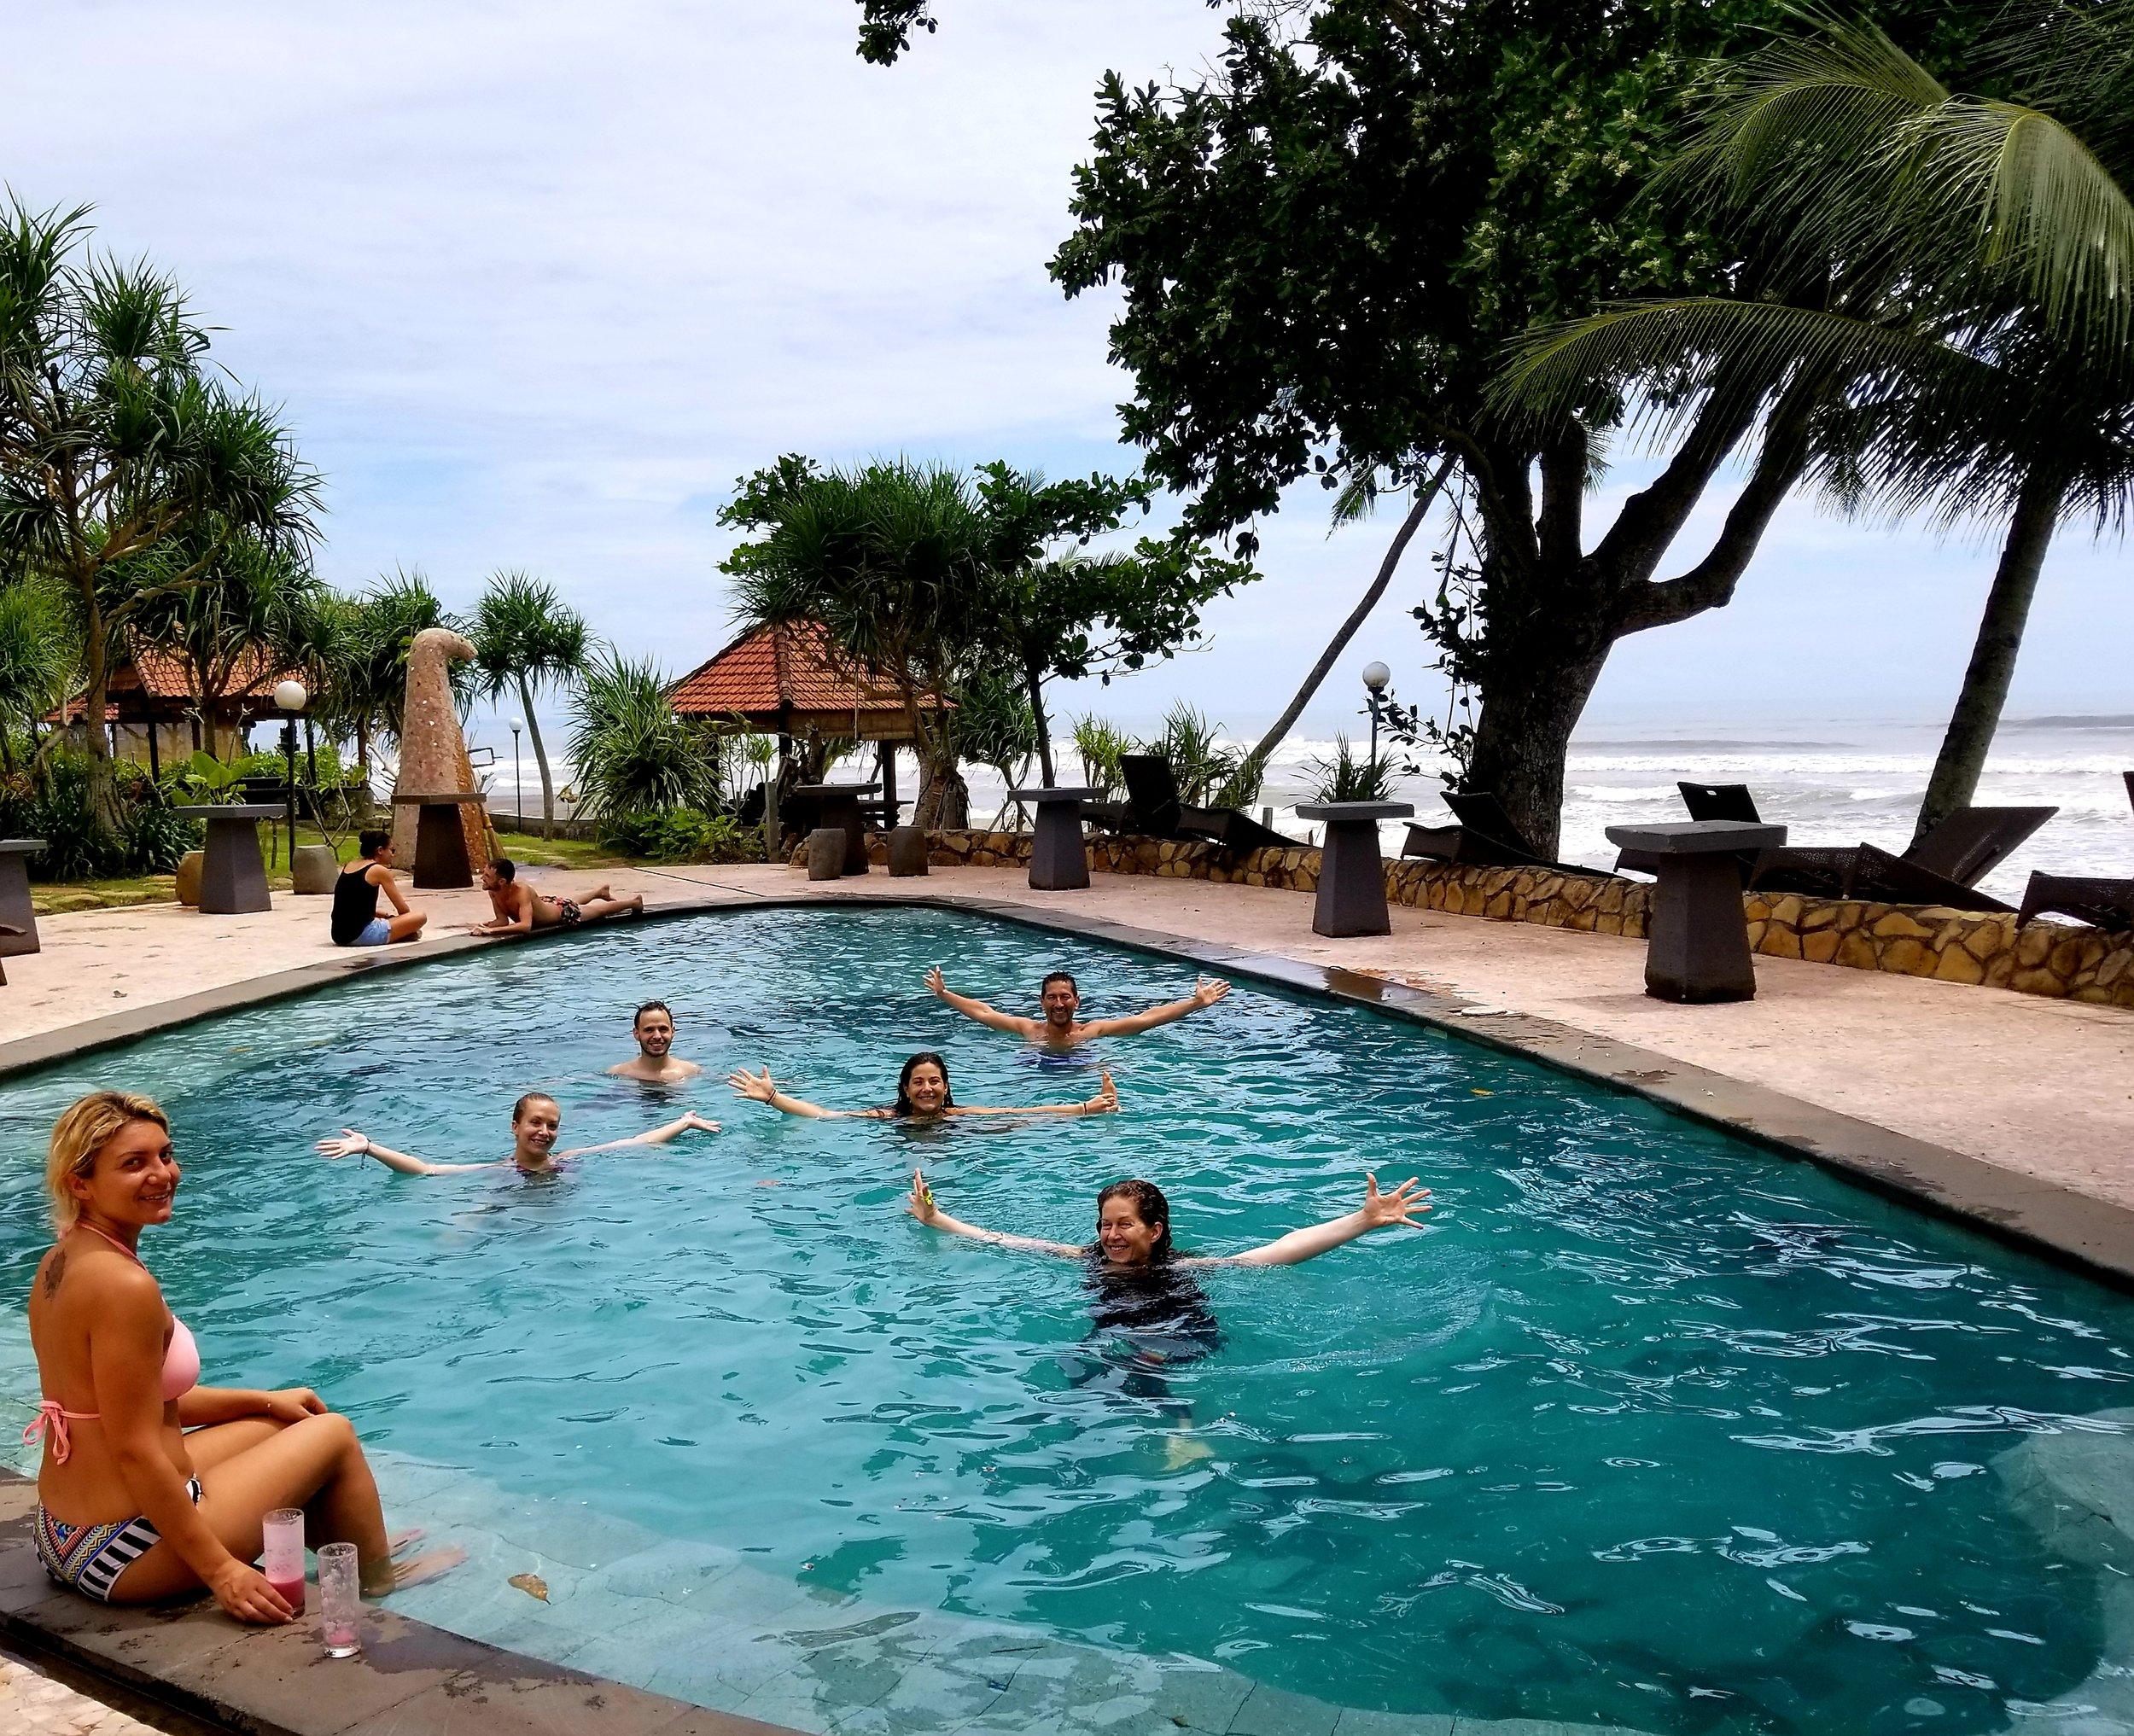 balian-beach-yoga-surf-retreat-pool.jpg